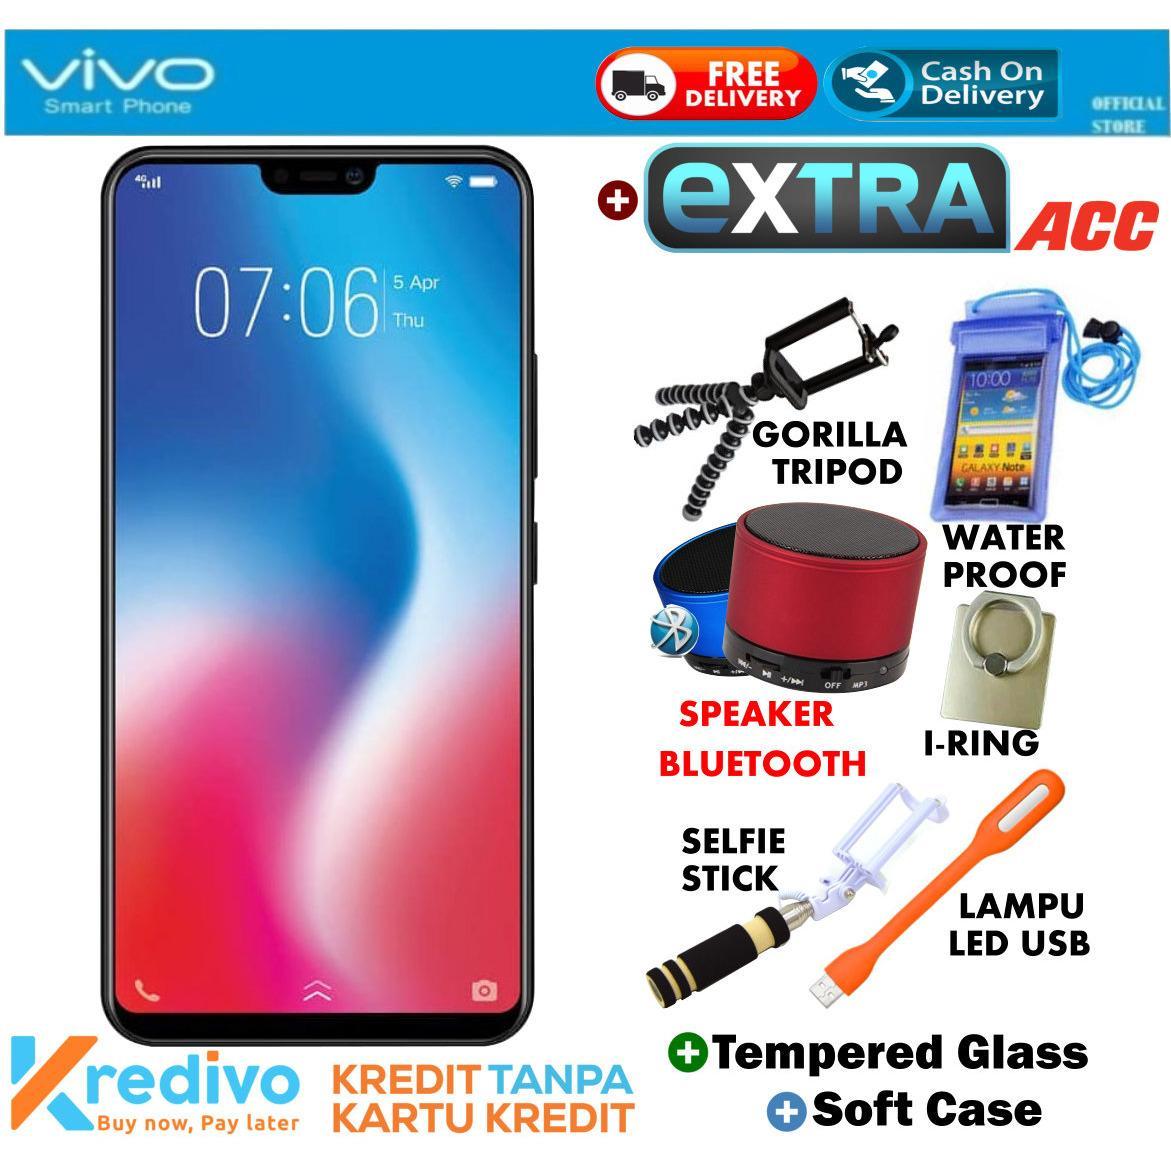 VIVO V9 4/64 - Gold Plus Extra Acc